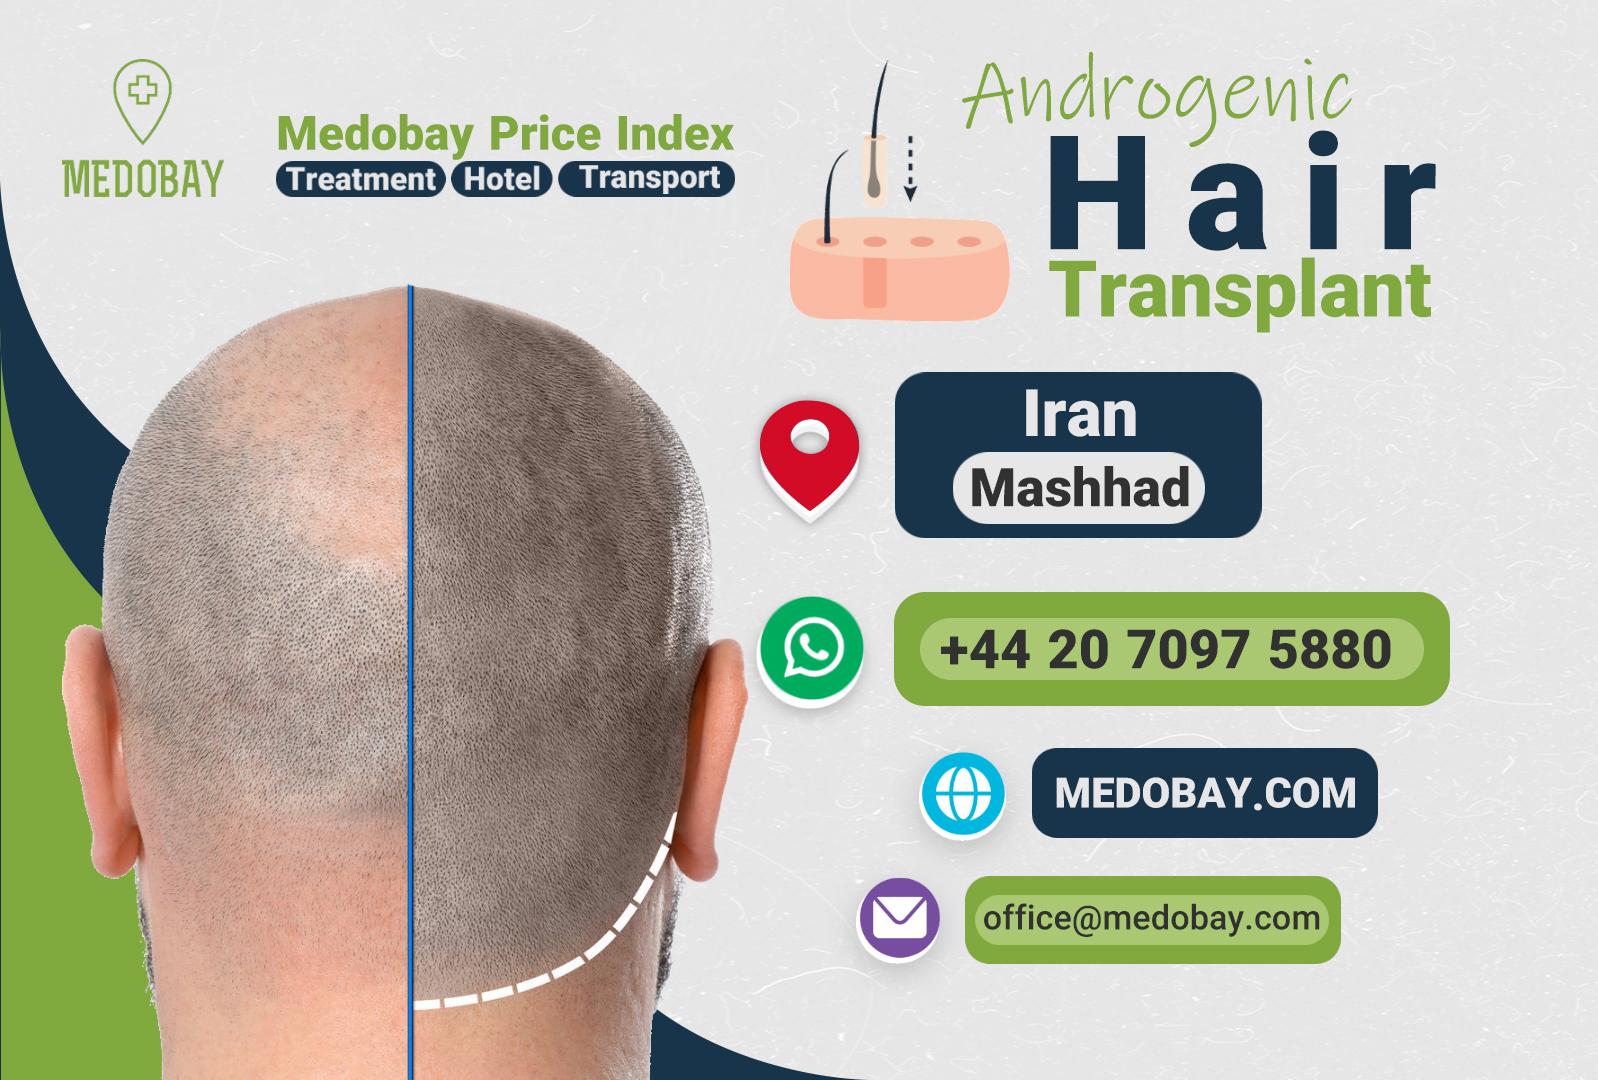 Androgenic Hair Transplant Mashhad